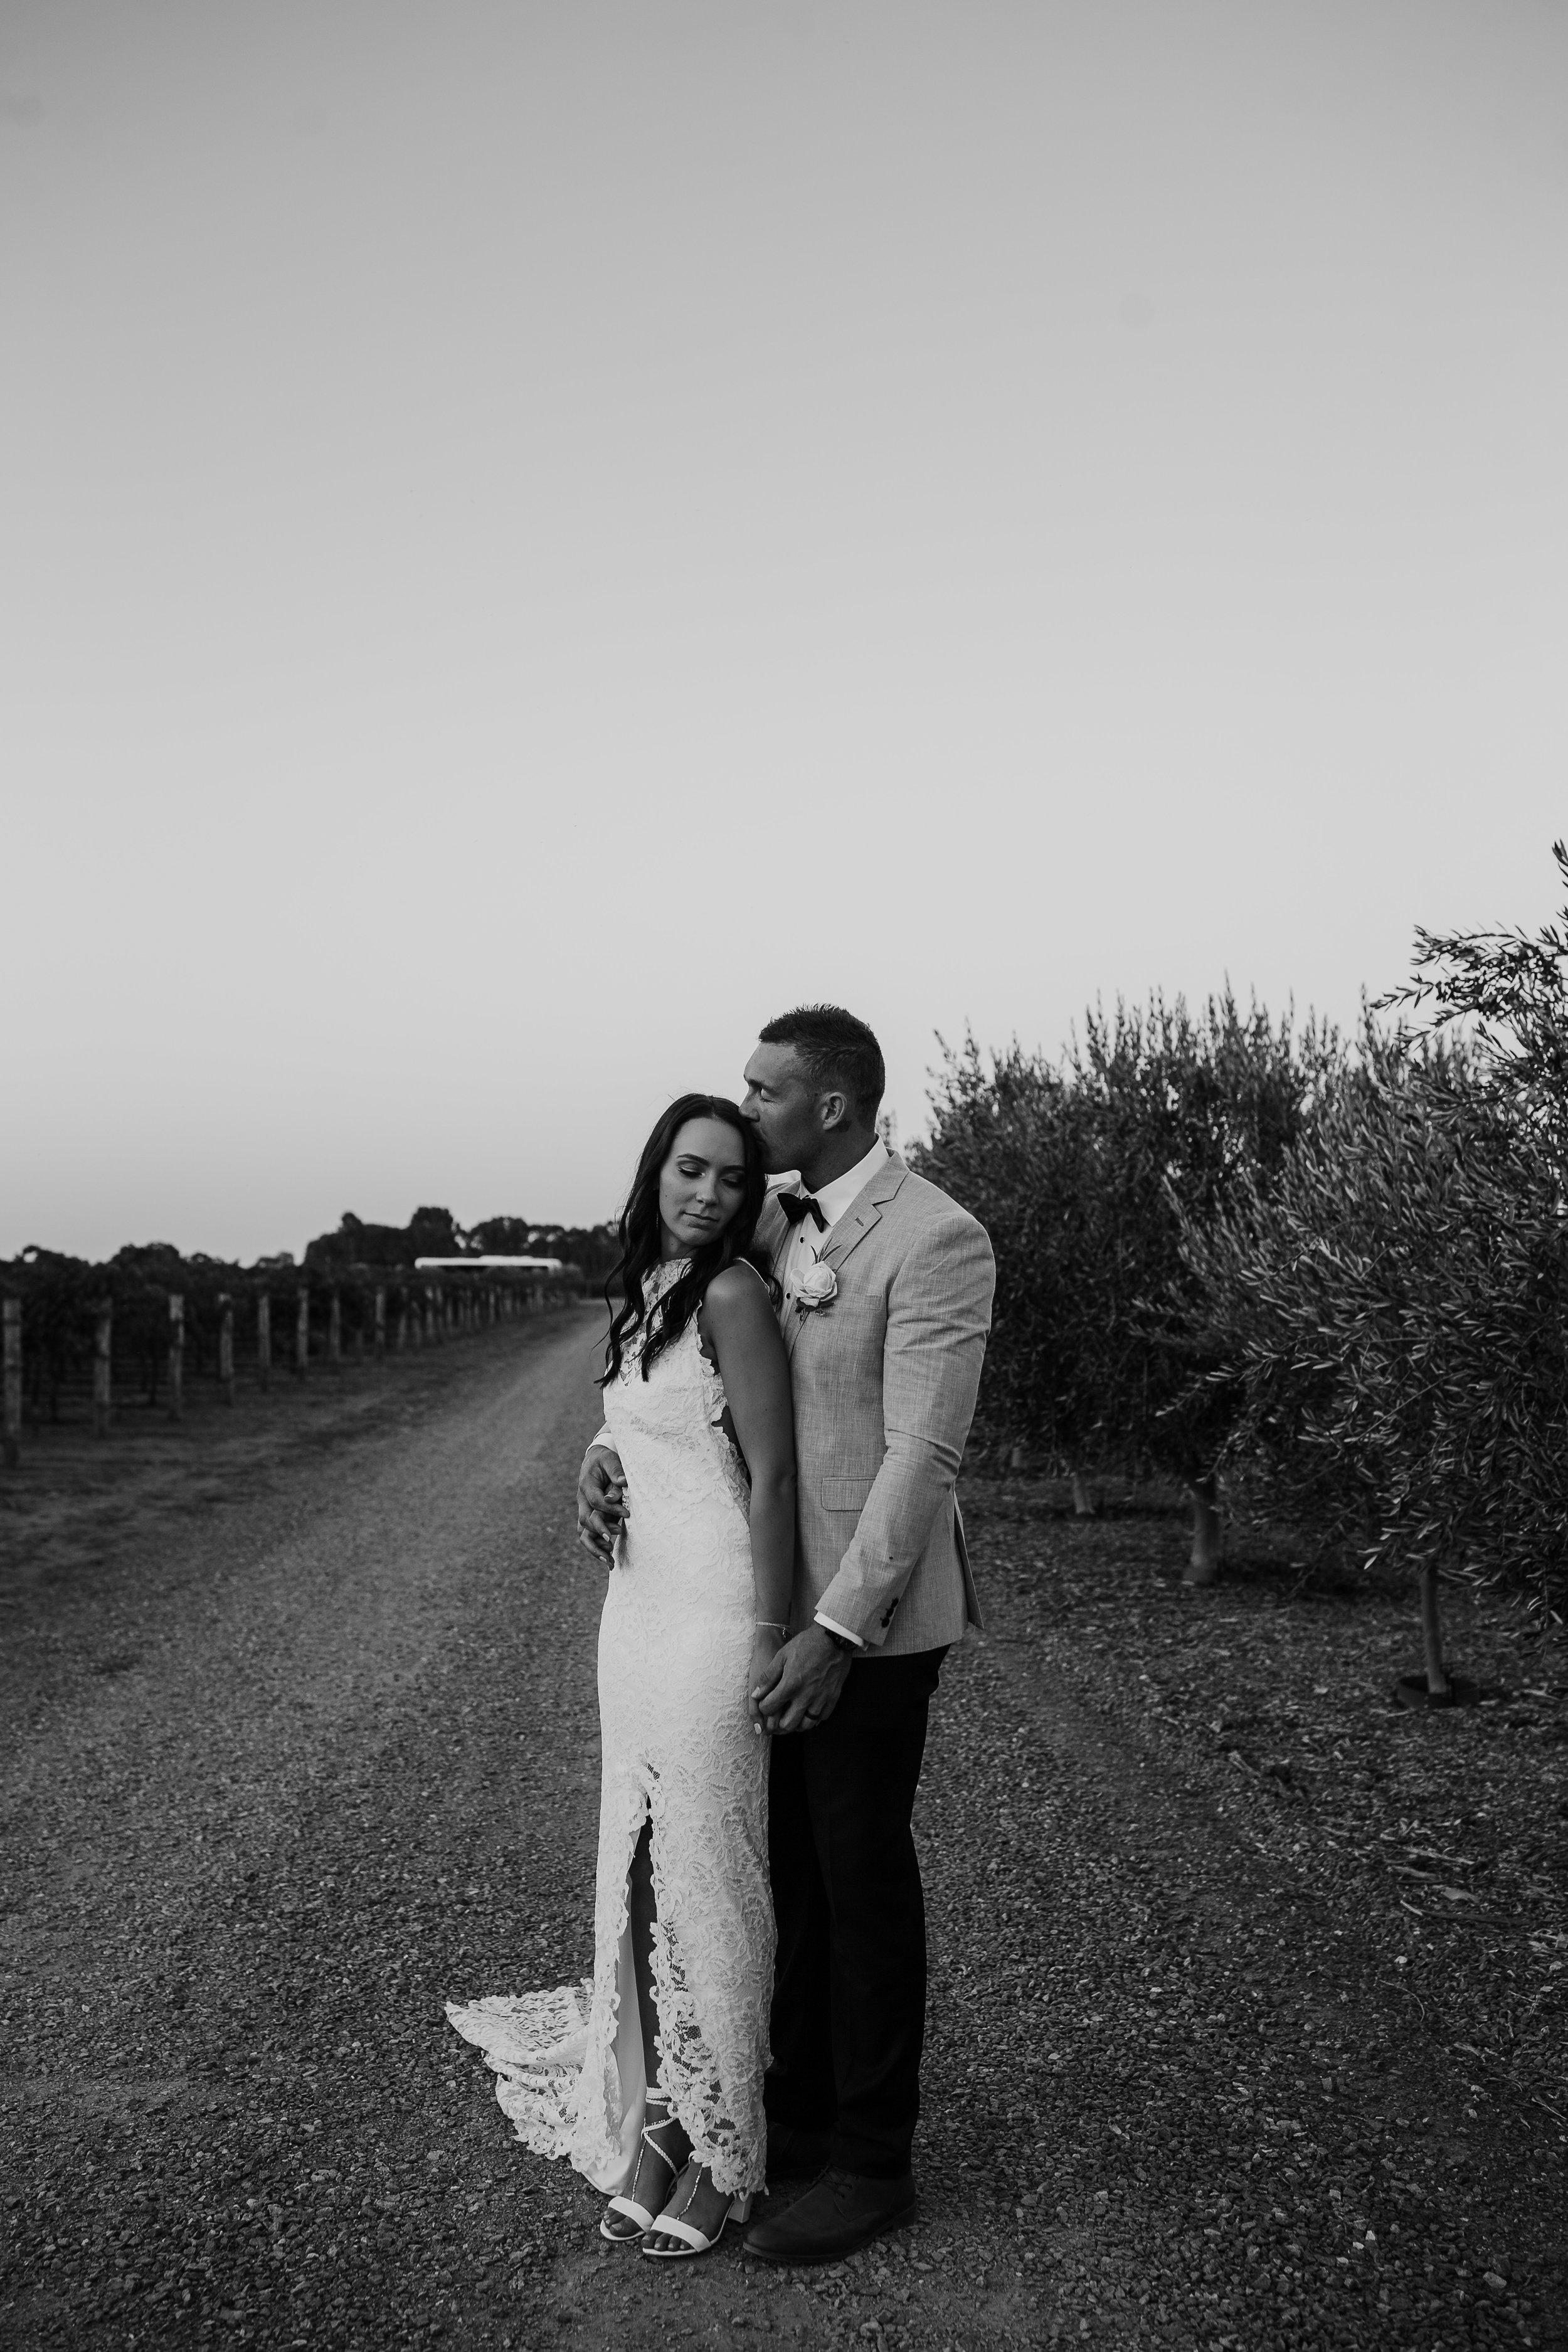 mickalathomas_puremacphotography_weddingphotographer_couplephotographer_Sheppartonphotographer_2931.jpg